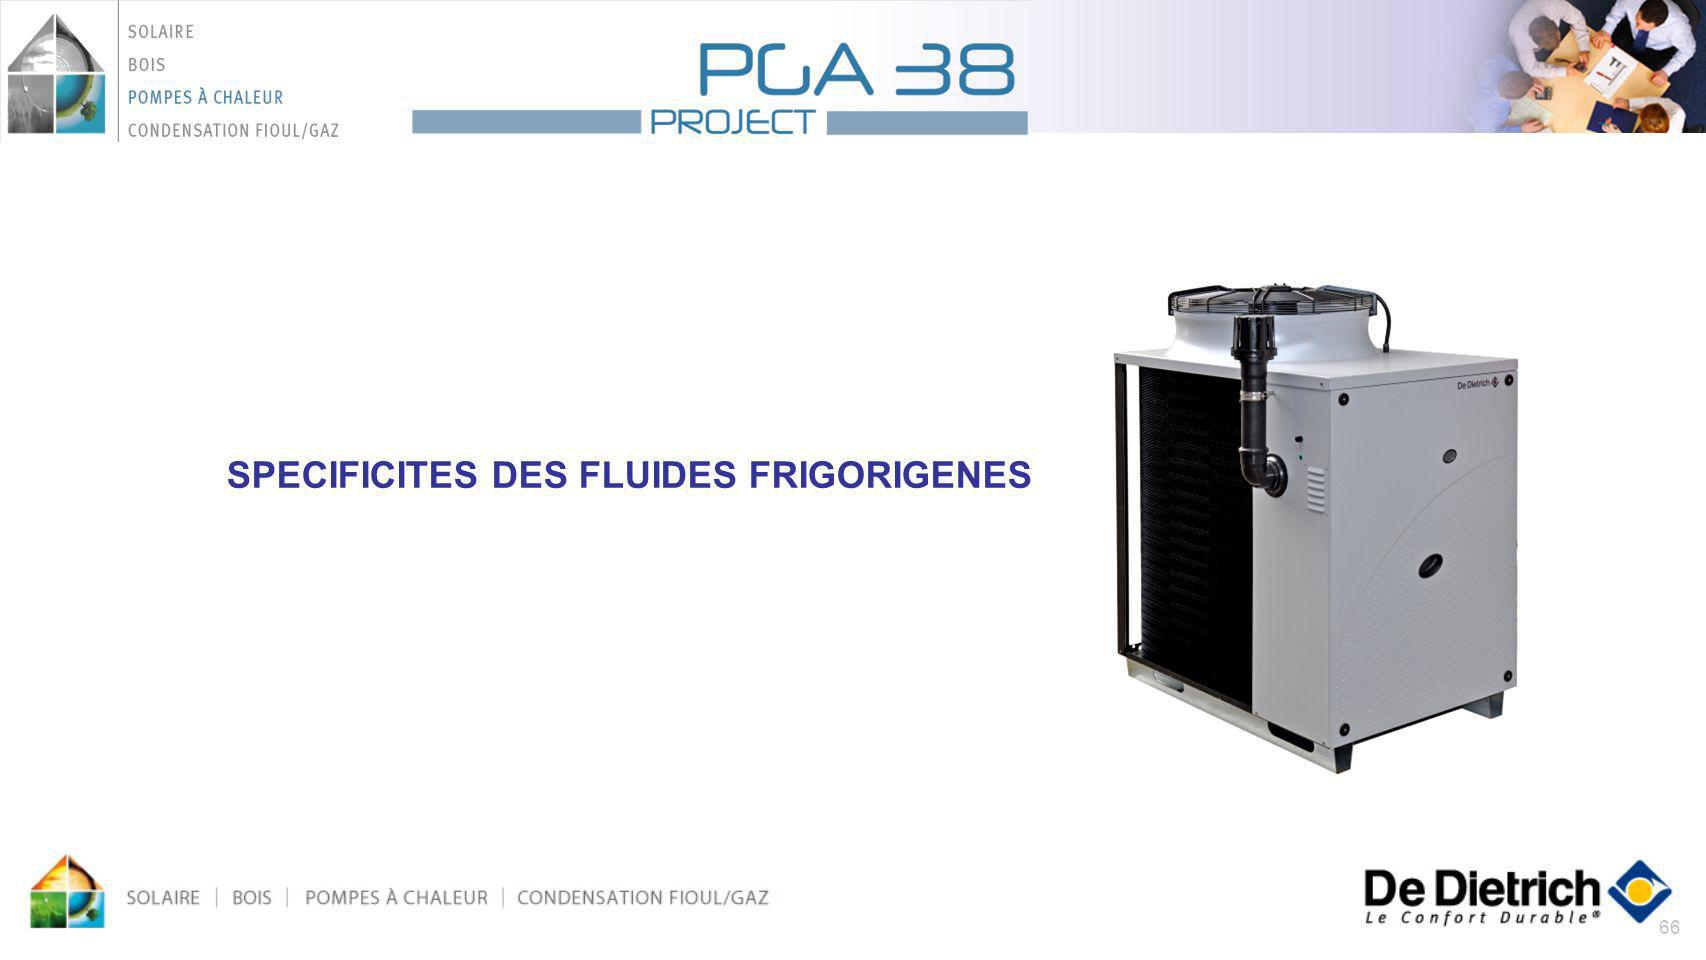 SPECIFICITES DES FLUIDES FRIGORIGENES